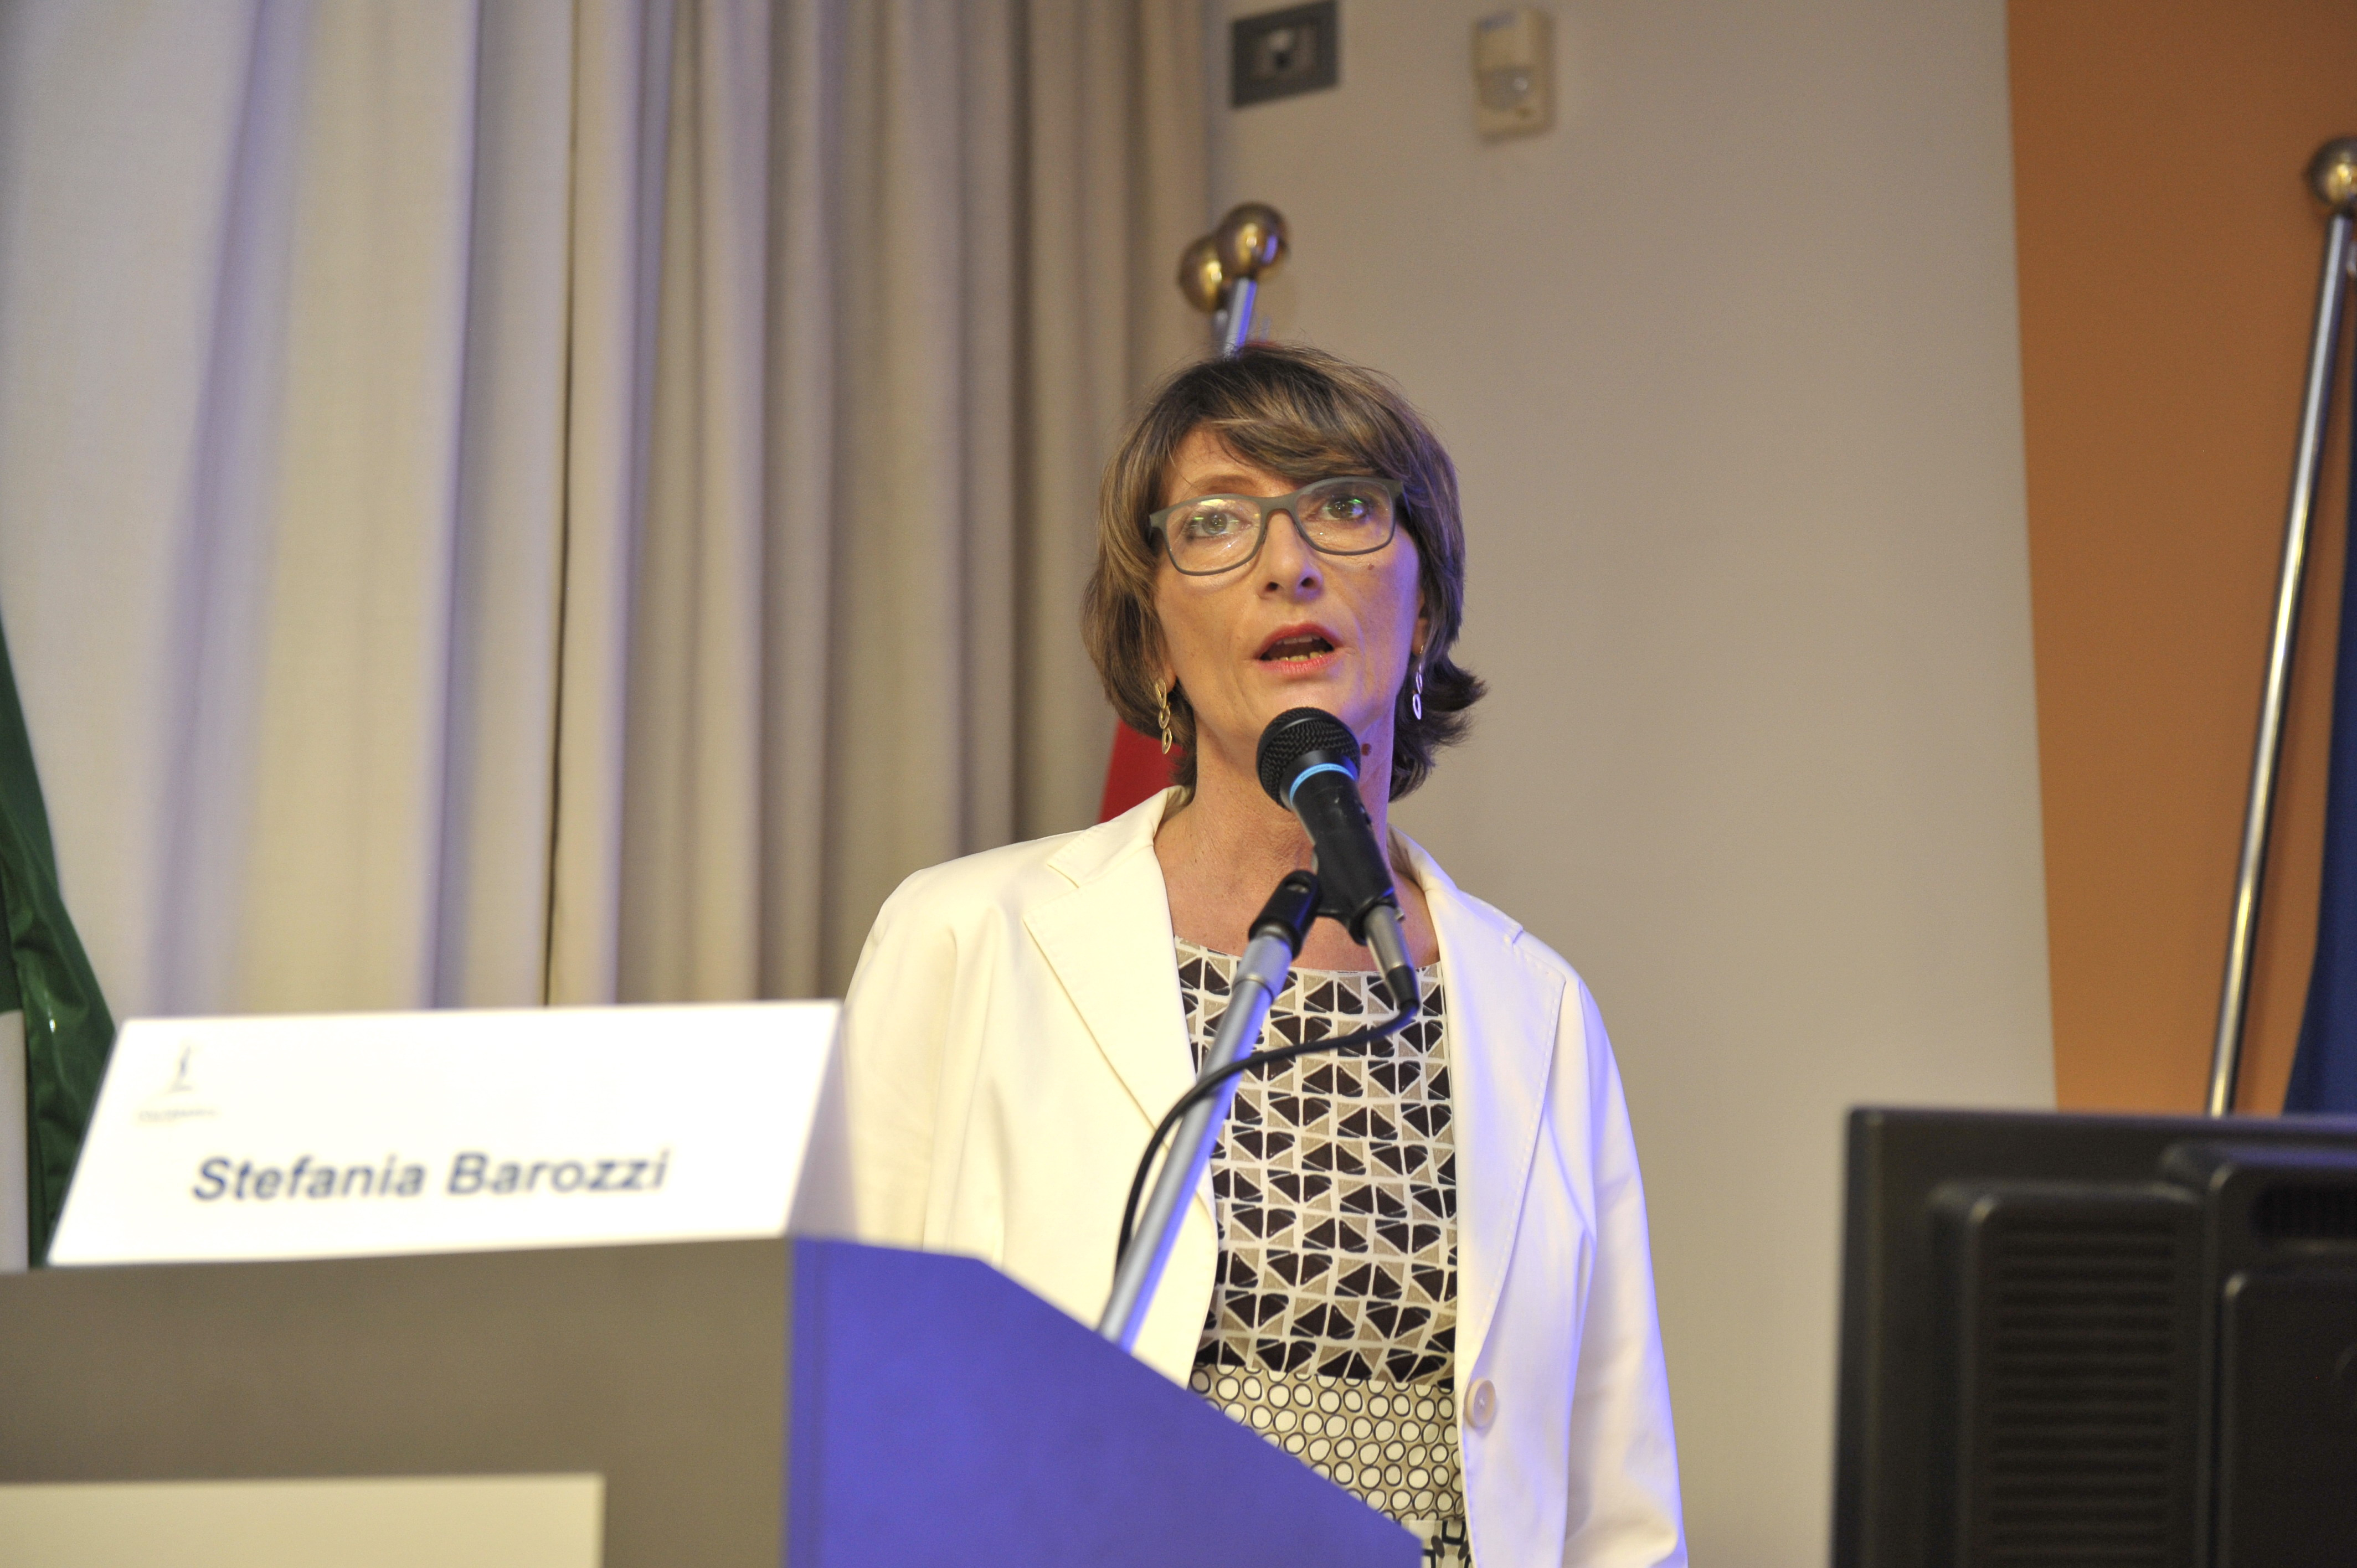 6.6.2015 - Interviene Stefania Barozzi, Audiologa, Otorinolaringoiatra